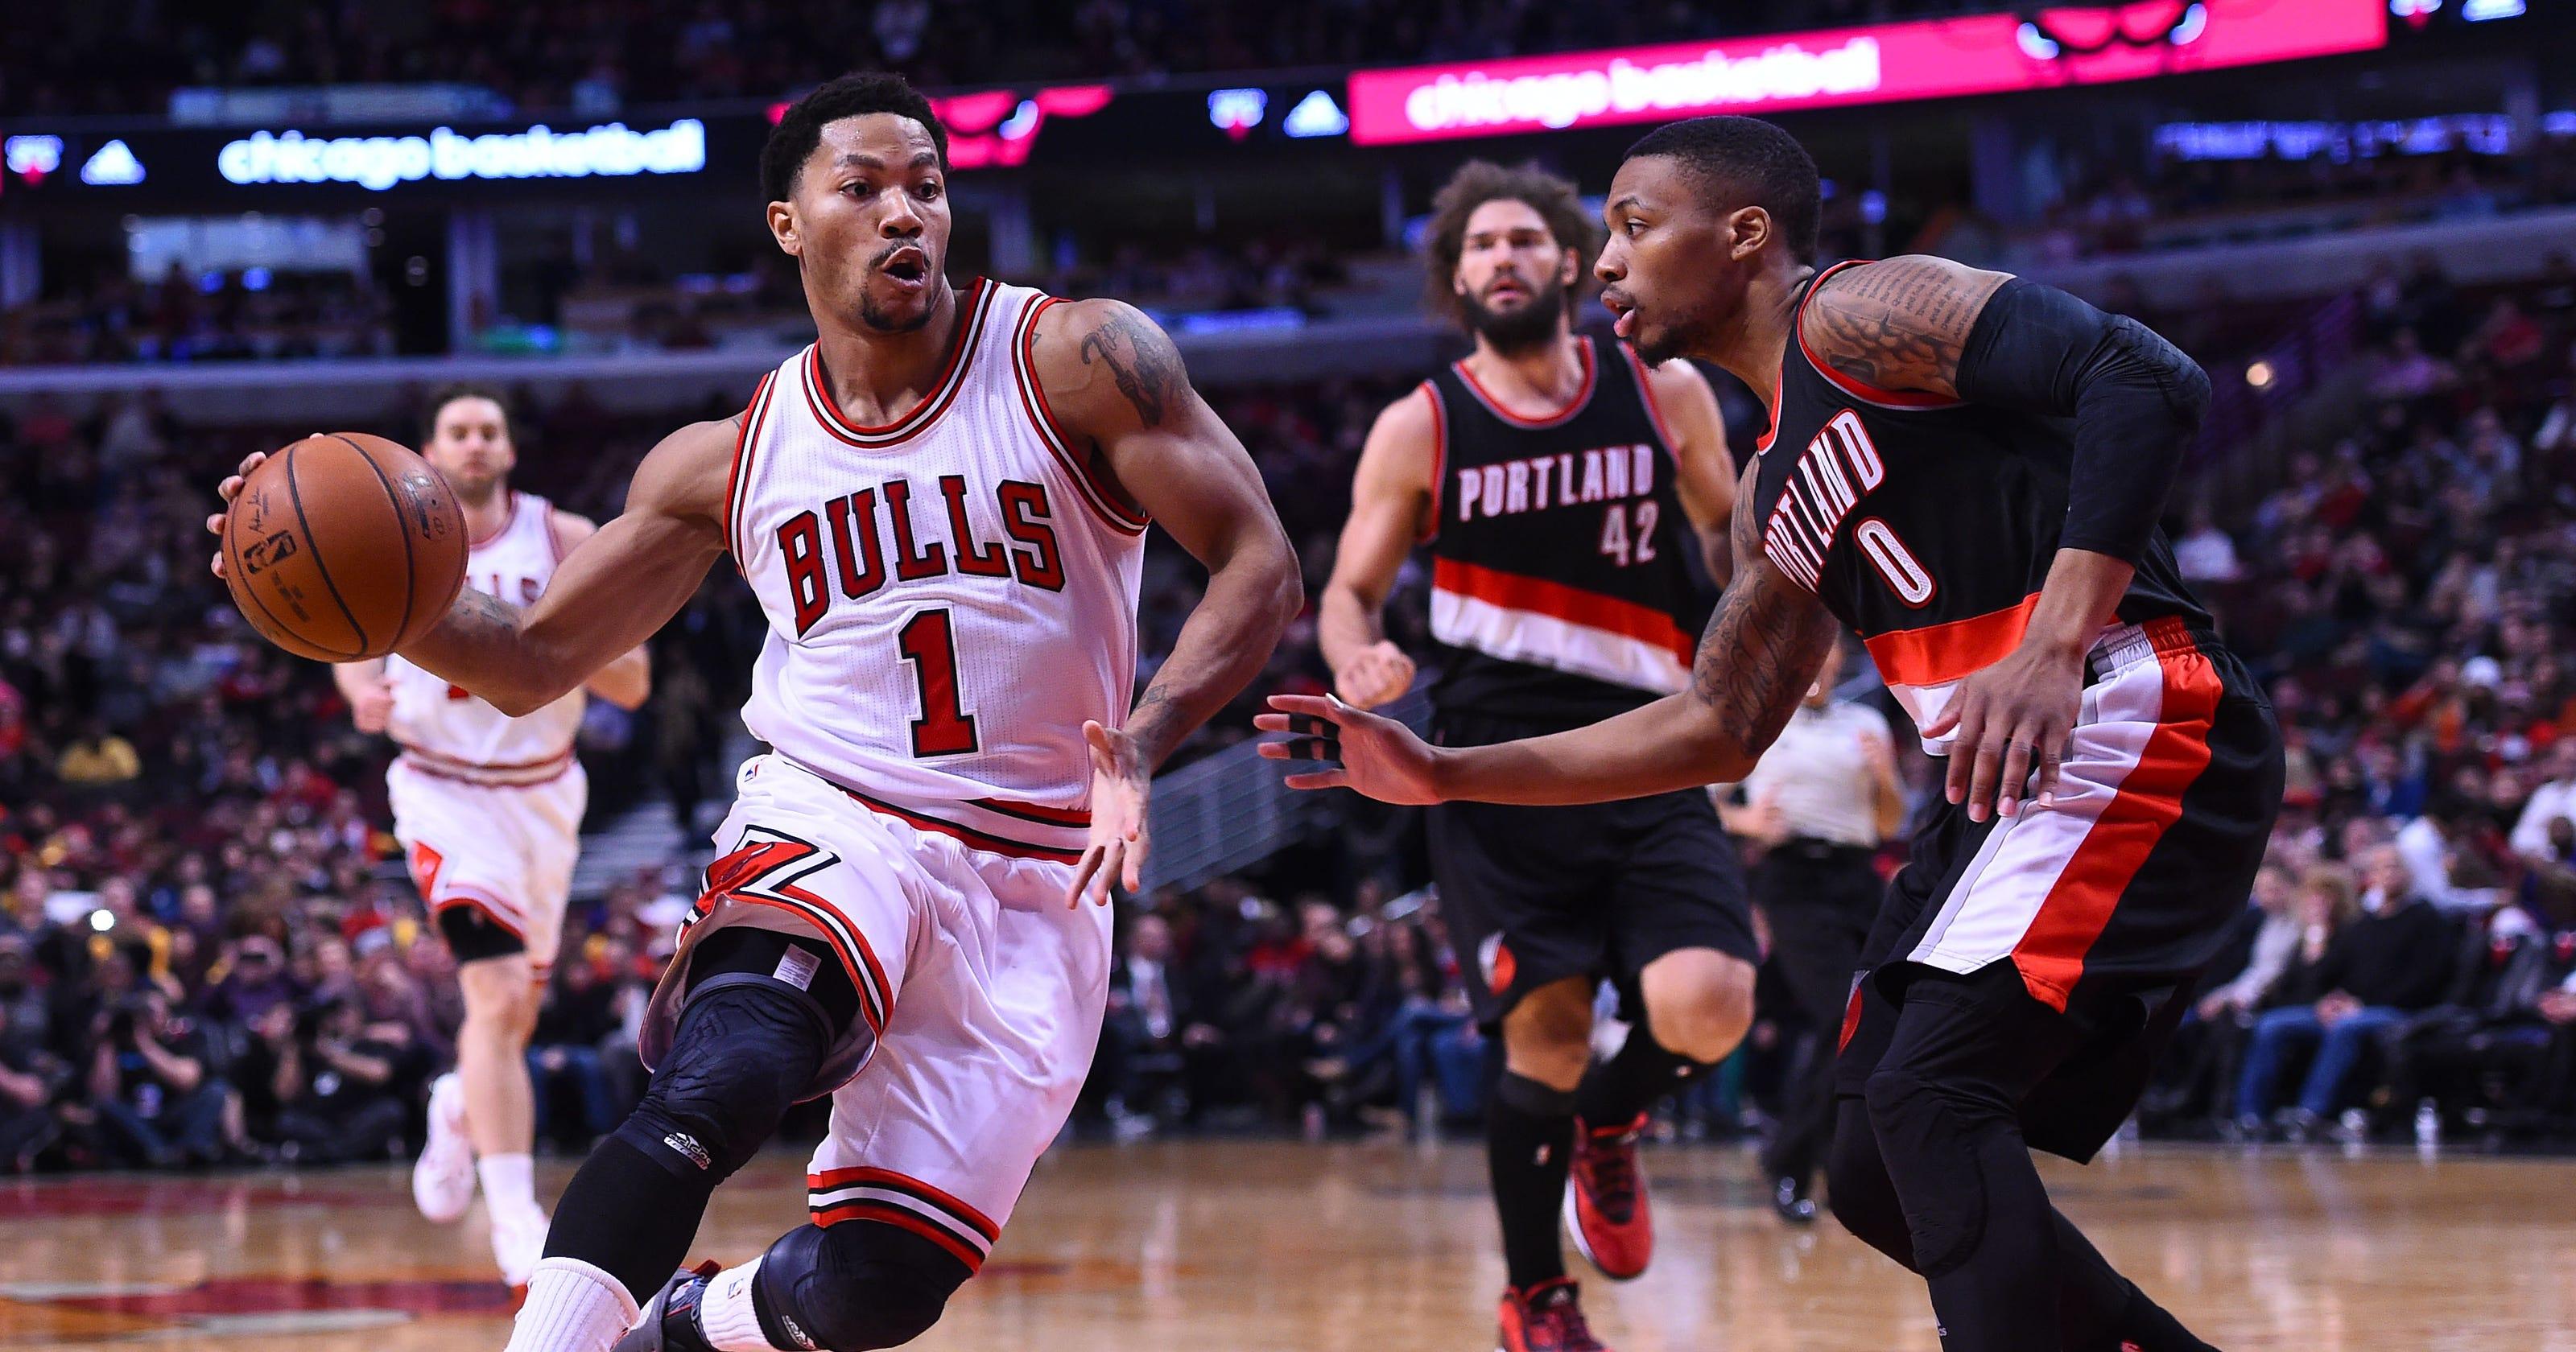 Derrick Rose Scores 31 To Lead Bulls Past Blazers